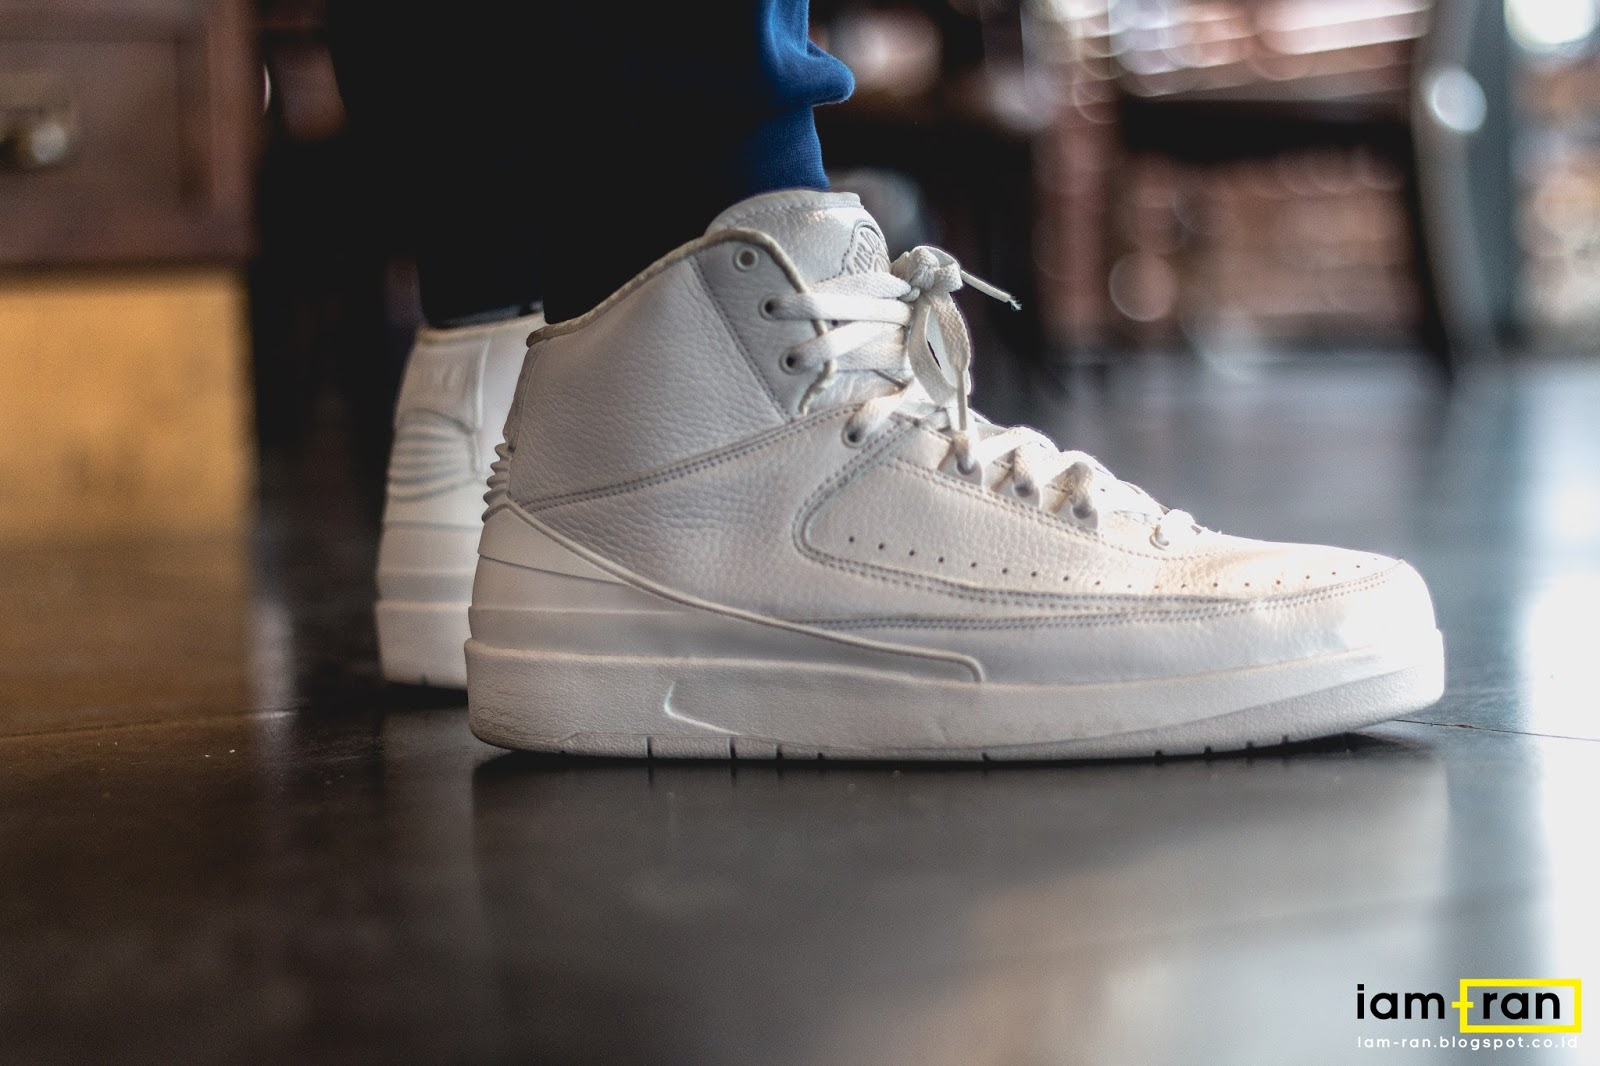 Iam Ran On Feet Winston Nike Air Jordan 2 25th Anniversary